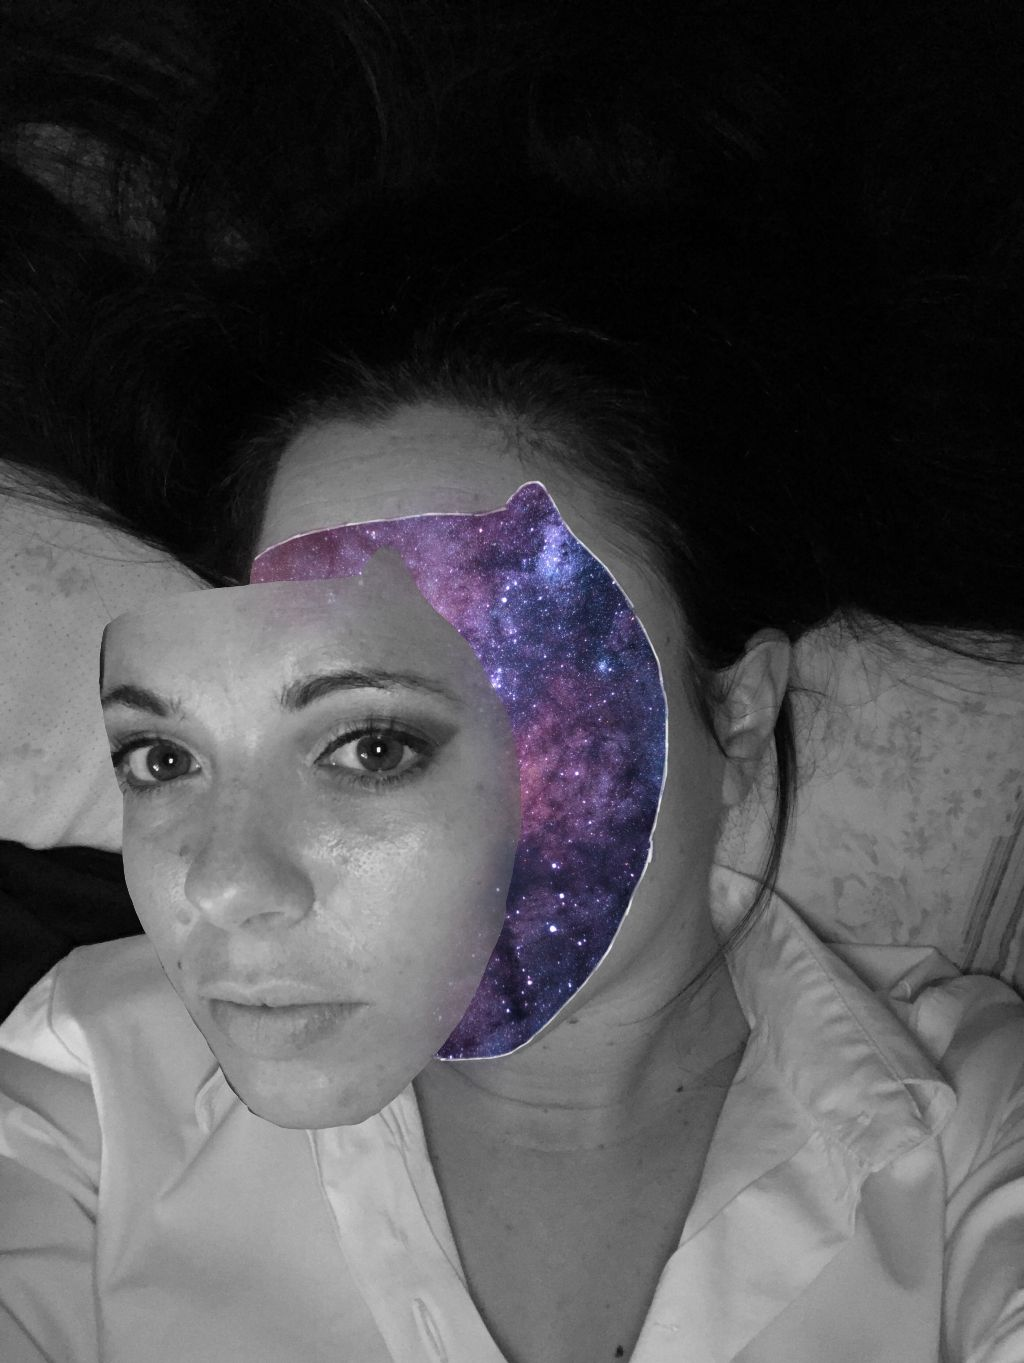 #freetoedit #galaxymagiceffect #facemask #galaxy #blackandwhite